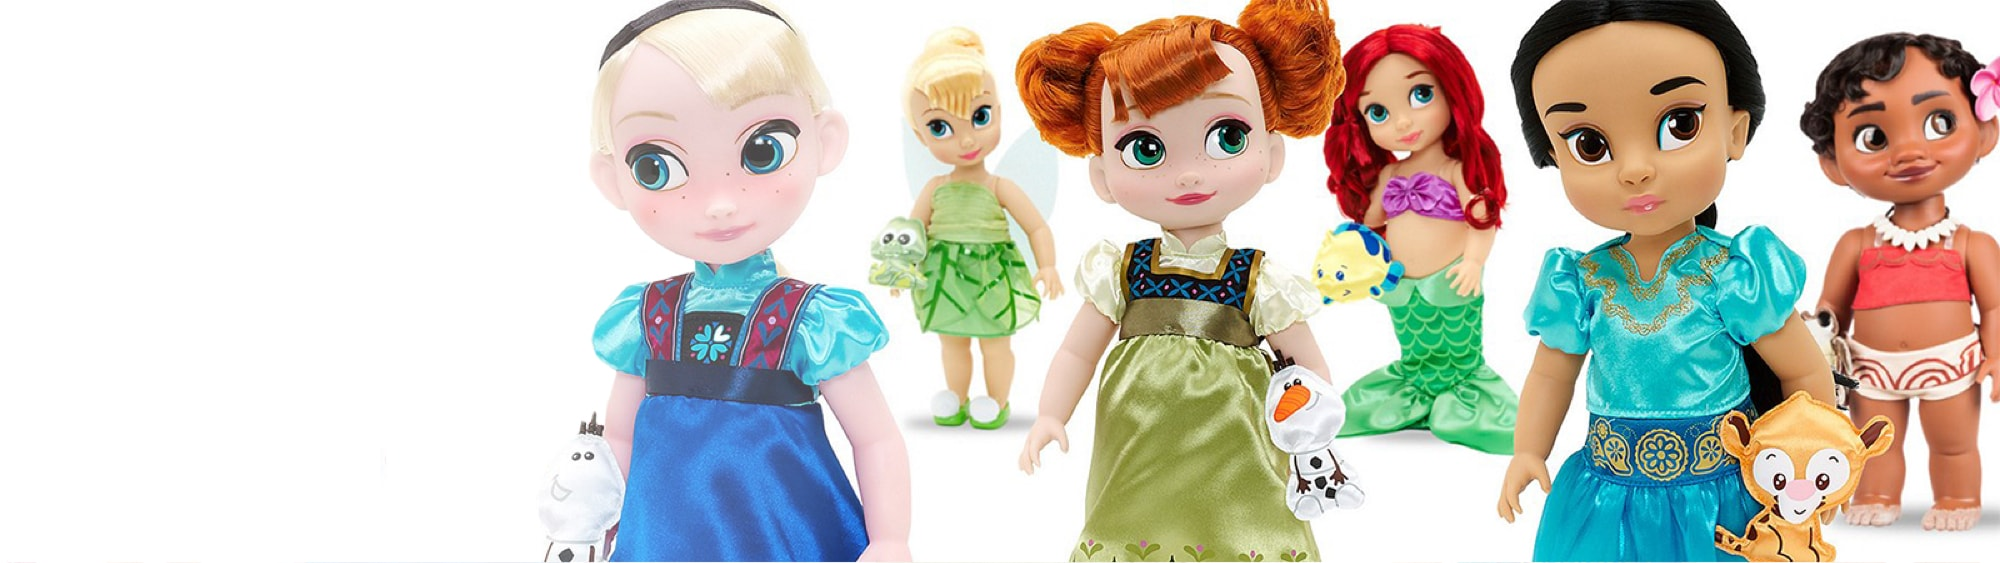 Disney Store | Animator Dolls